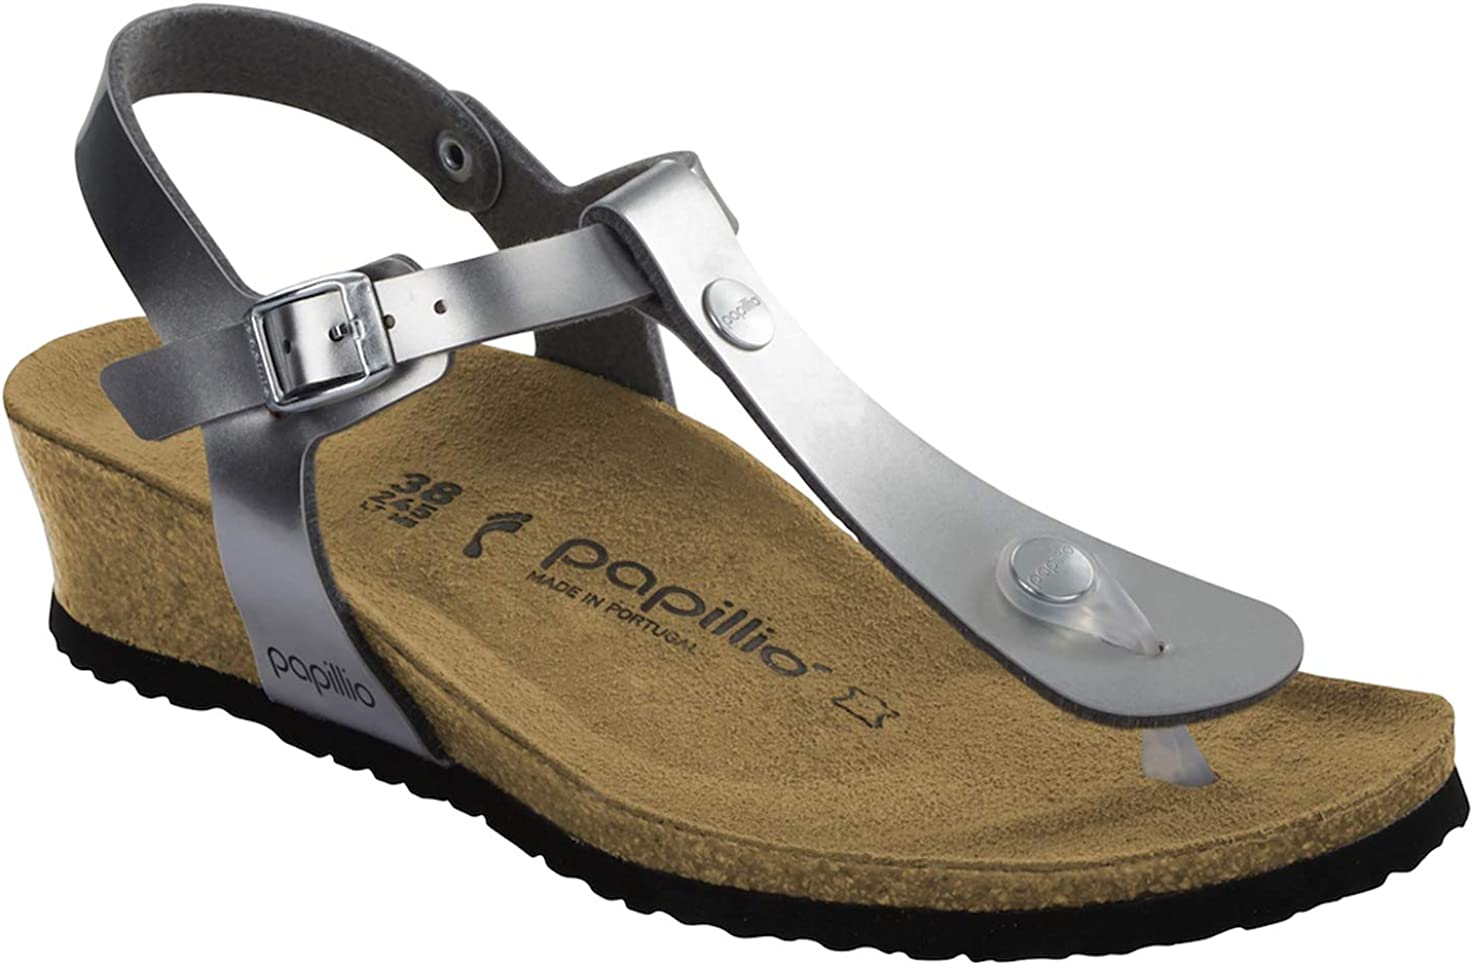 Birkenstock Papillio Women's Ashley Sandal, Light Silver, 42 M EU